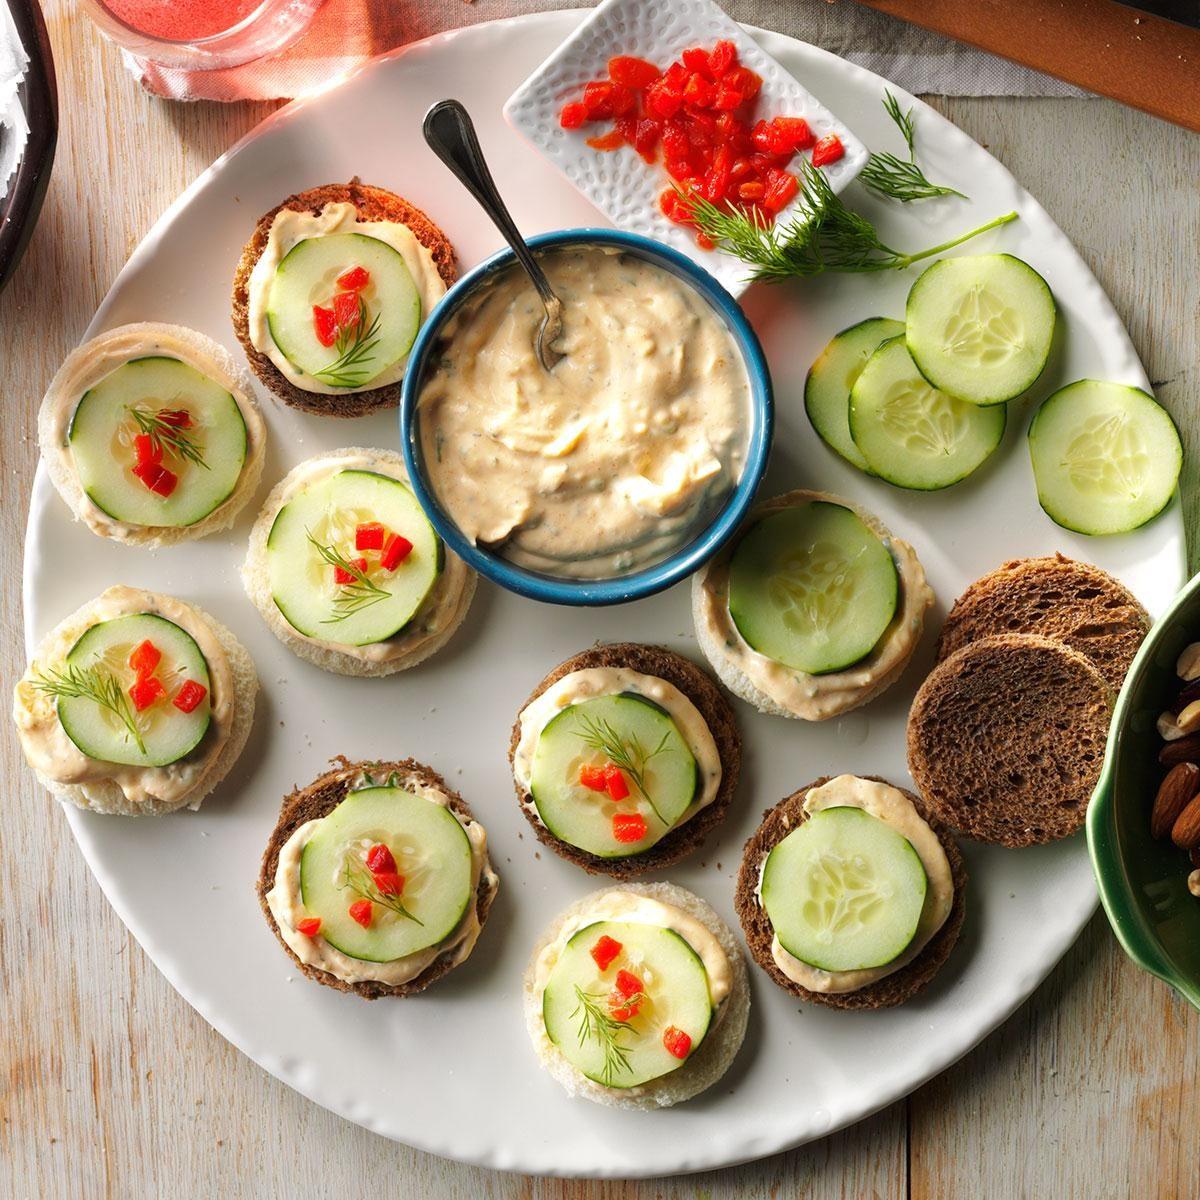 Cold Finger Food Ideas: Cucumber Canapes Recipe